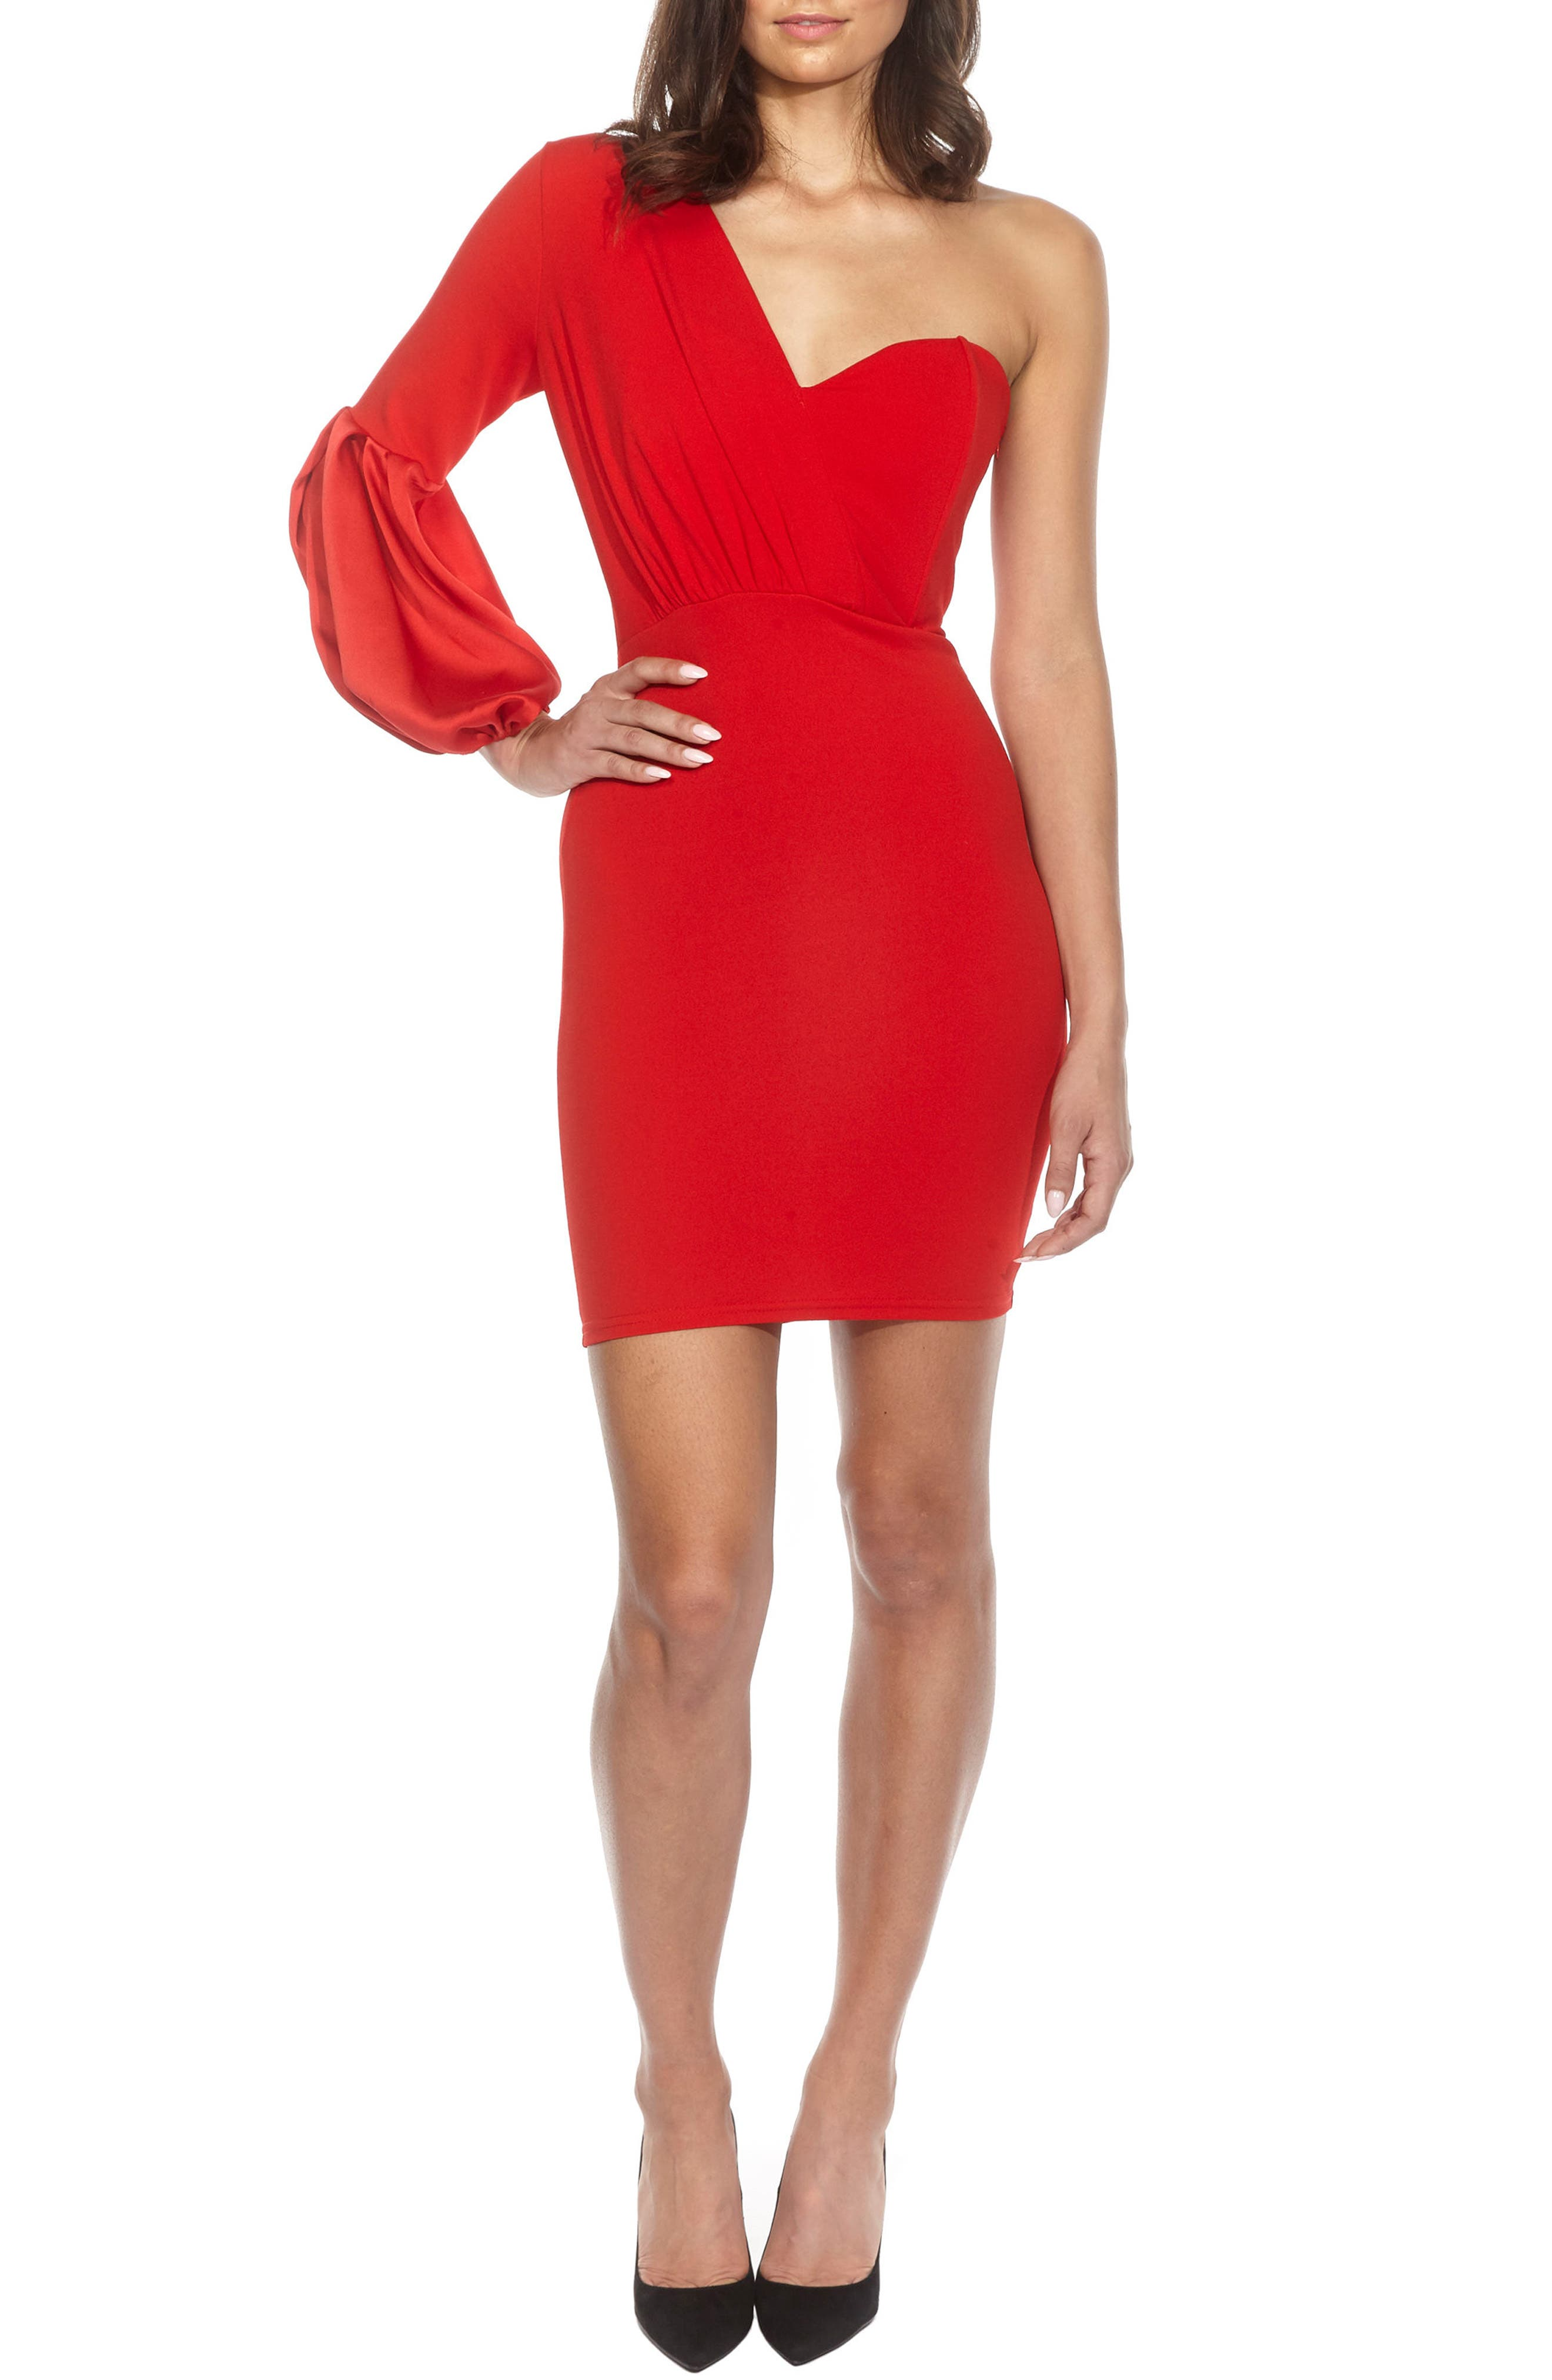 Naeva One-Shoulder Minidress,                         Main,                         color,